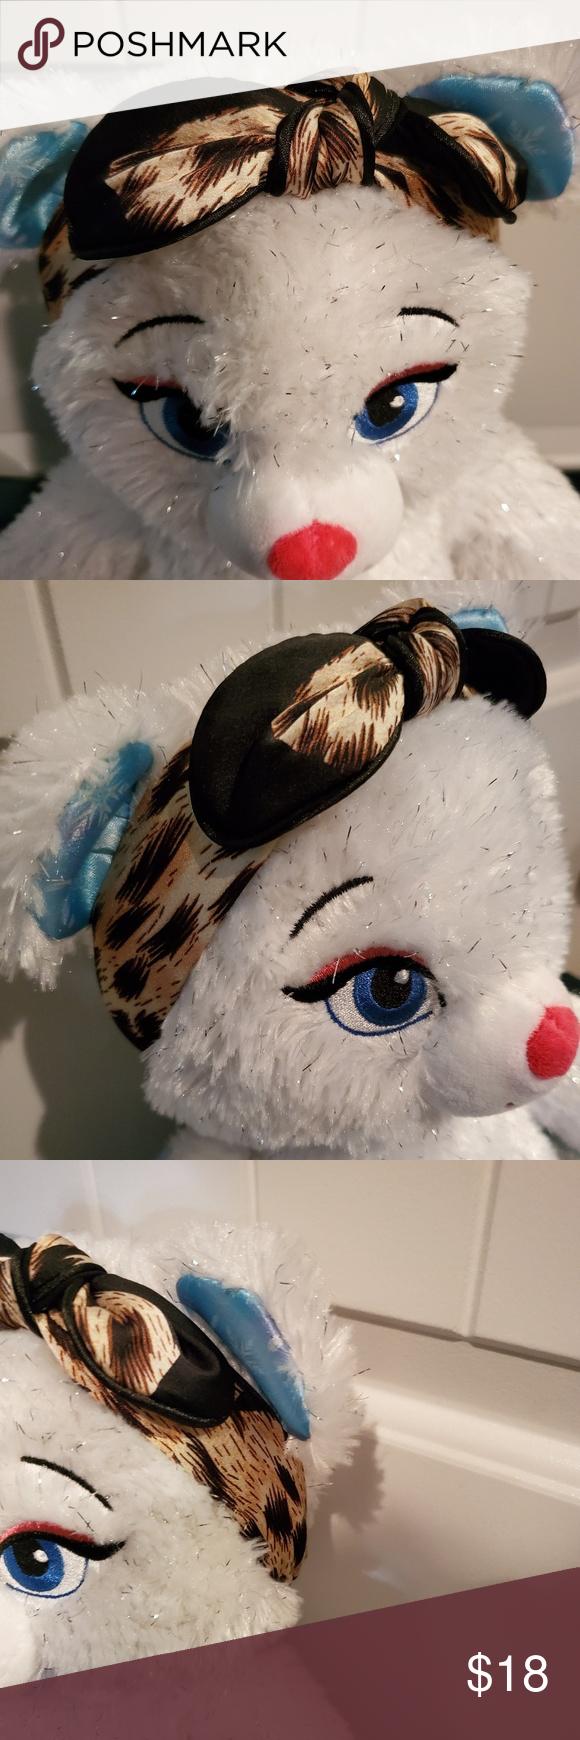 Animal Print Headband The perfect headband for fall & winter! Adorable animal pr...  Animal Print Headband The perfect headband for fall & winter! Adorable animal print headband with b #Adorable #Animal #Fall #Headband #Perfect #Print #winter